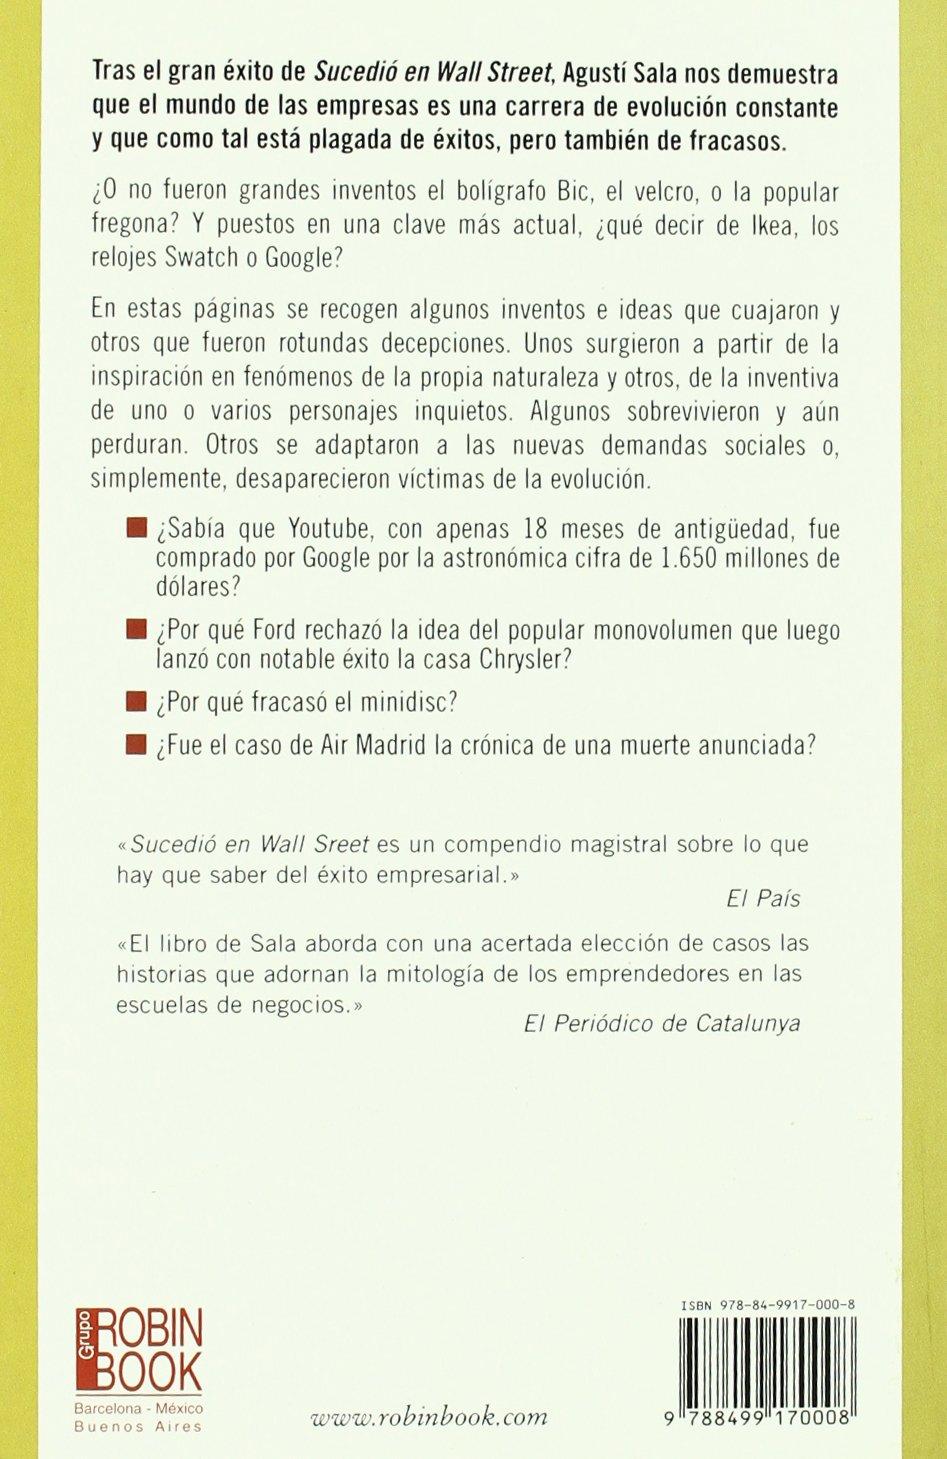 HISTORIAS CURIOSAS DE LOS NEGOCIOS (Spanish Edition): SALA AGUSTI: 9788499170008: Amazon.com: Books